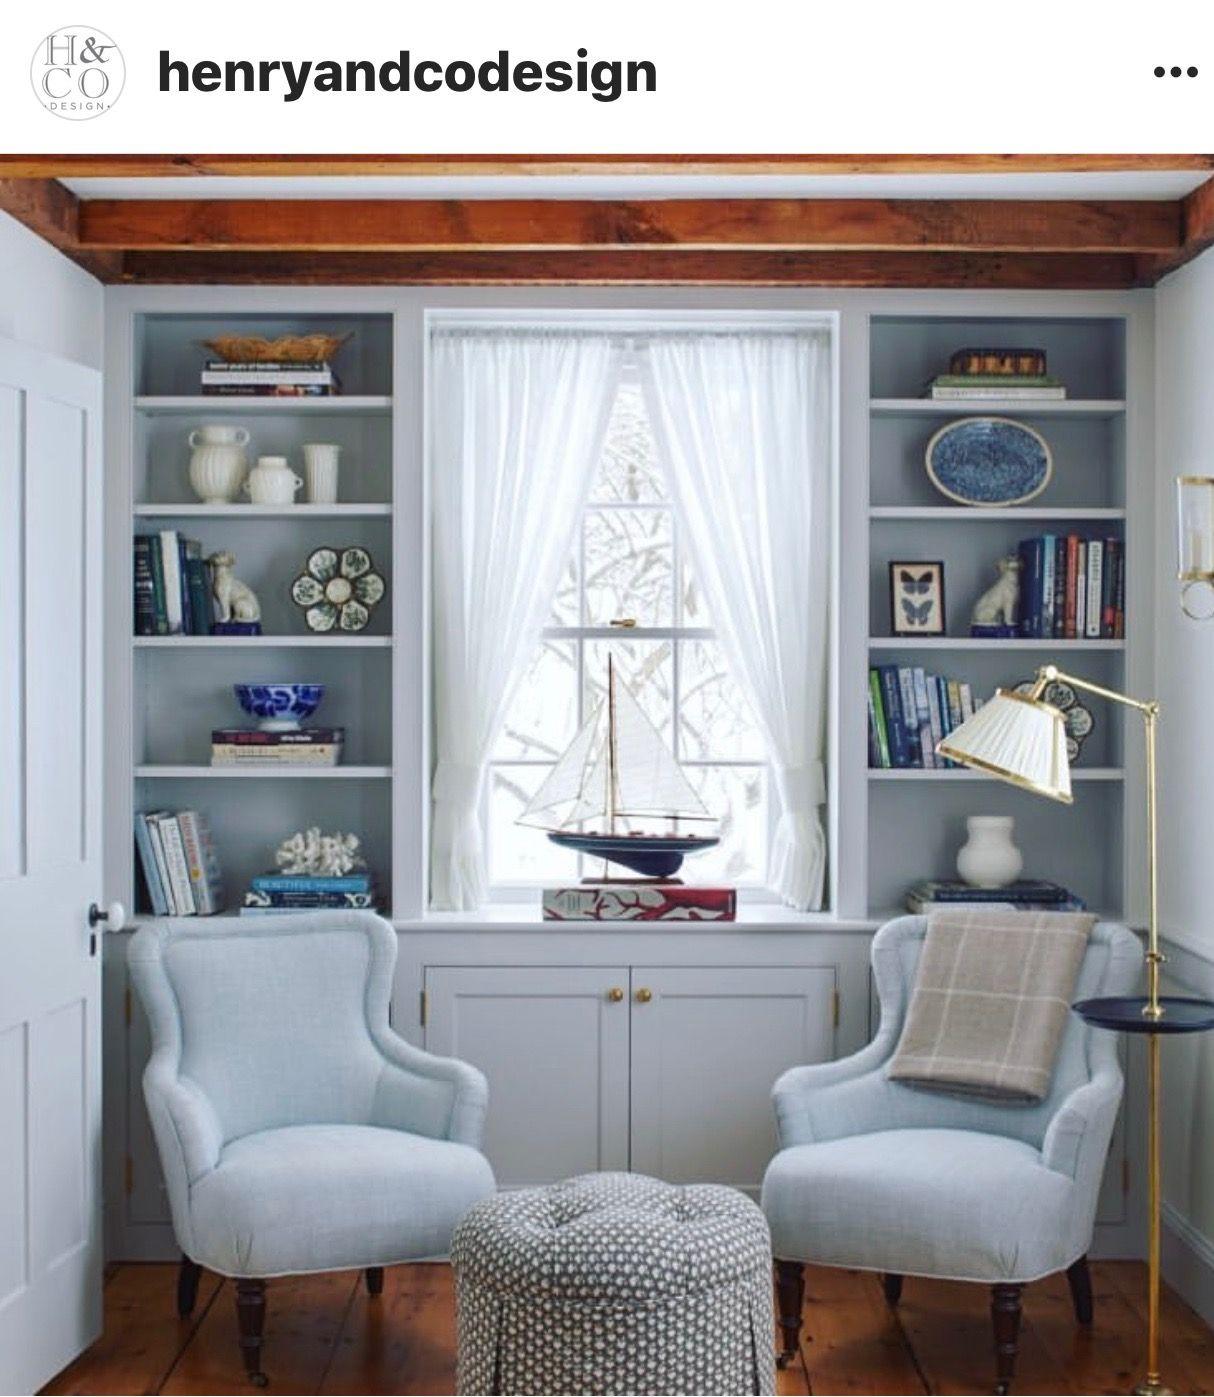 arranging bedroom furniture imagencr interiors